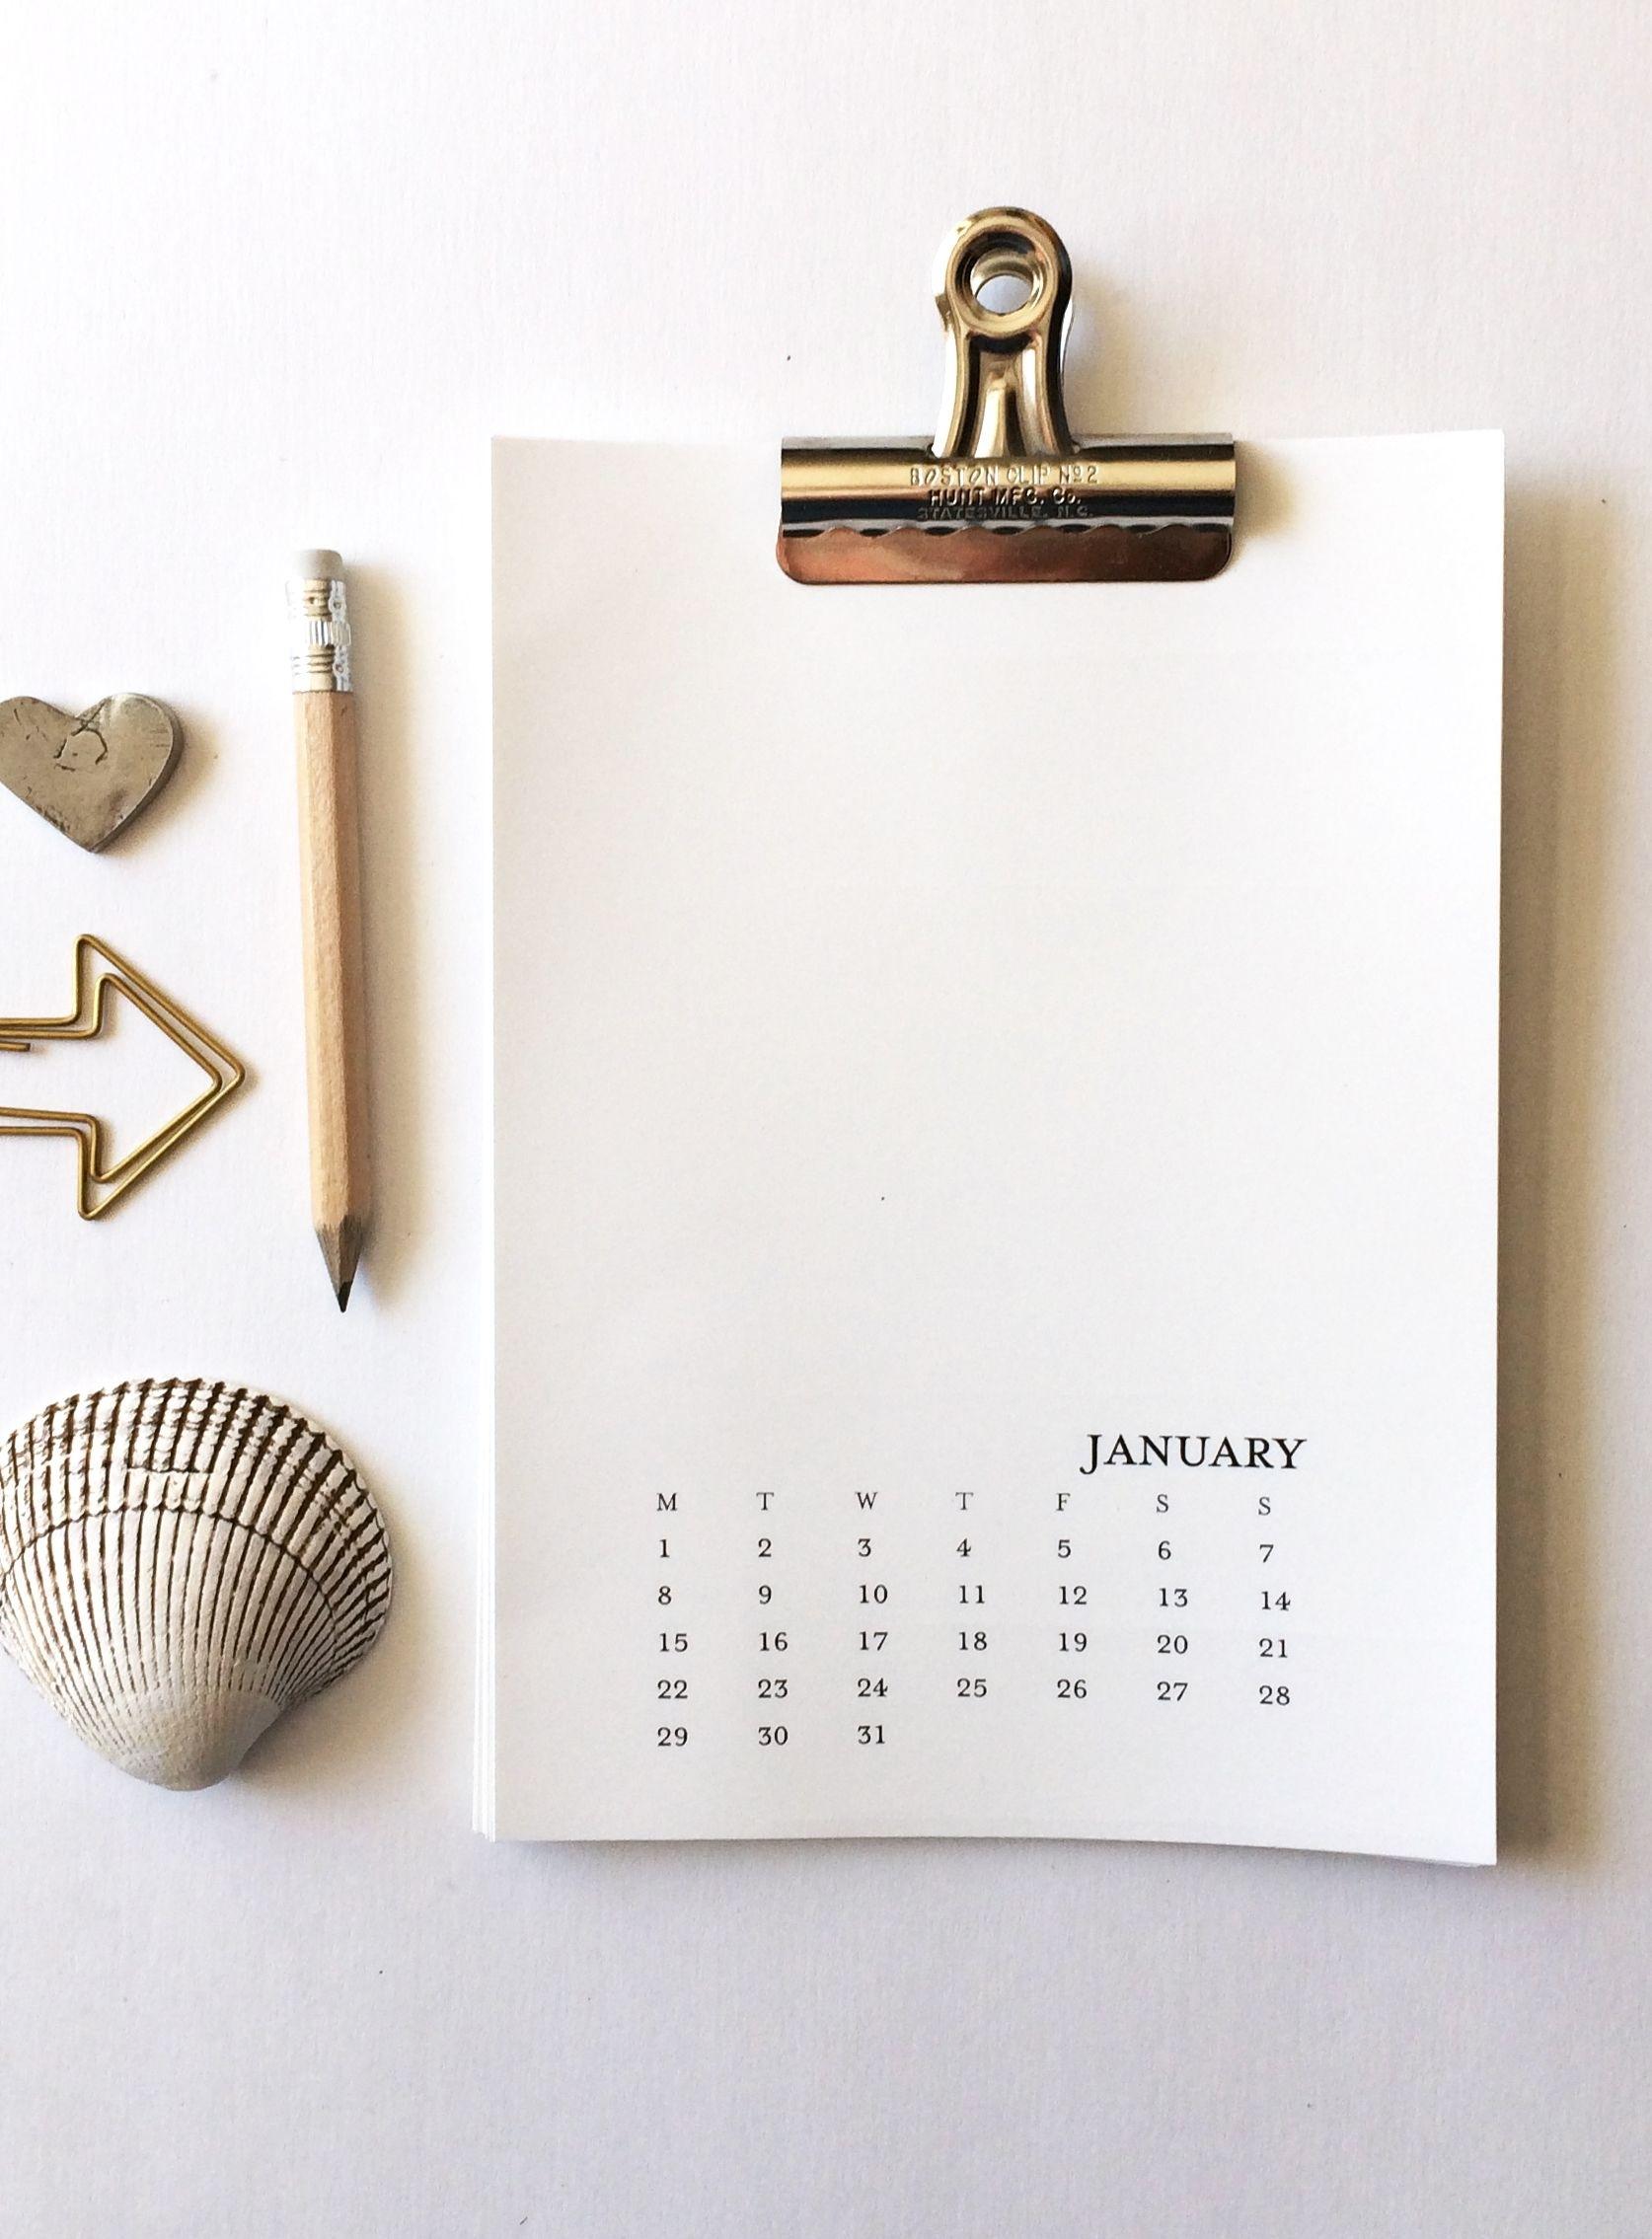 2020 Printable Calendar 5X7 Monday-Sunday - Printable 5 X 7 Blank Printable Calendar